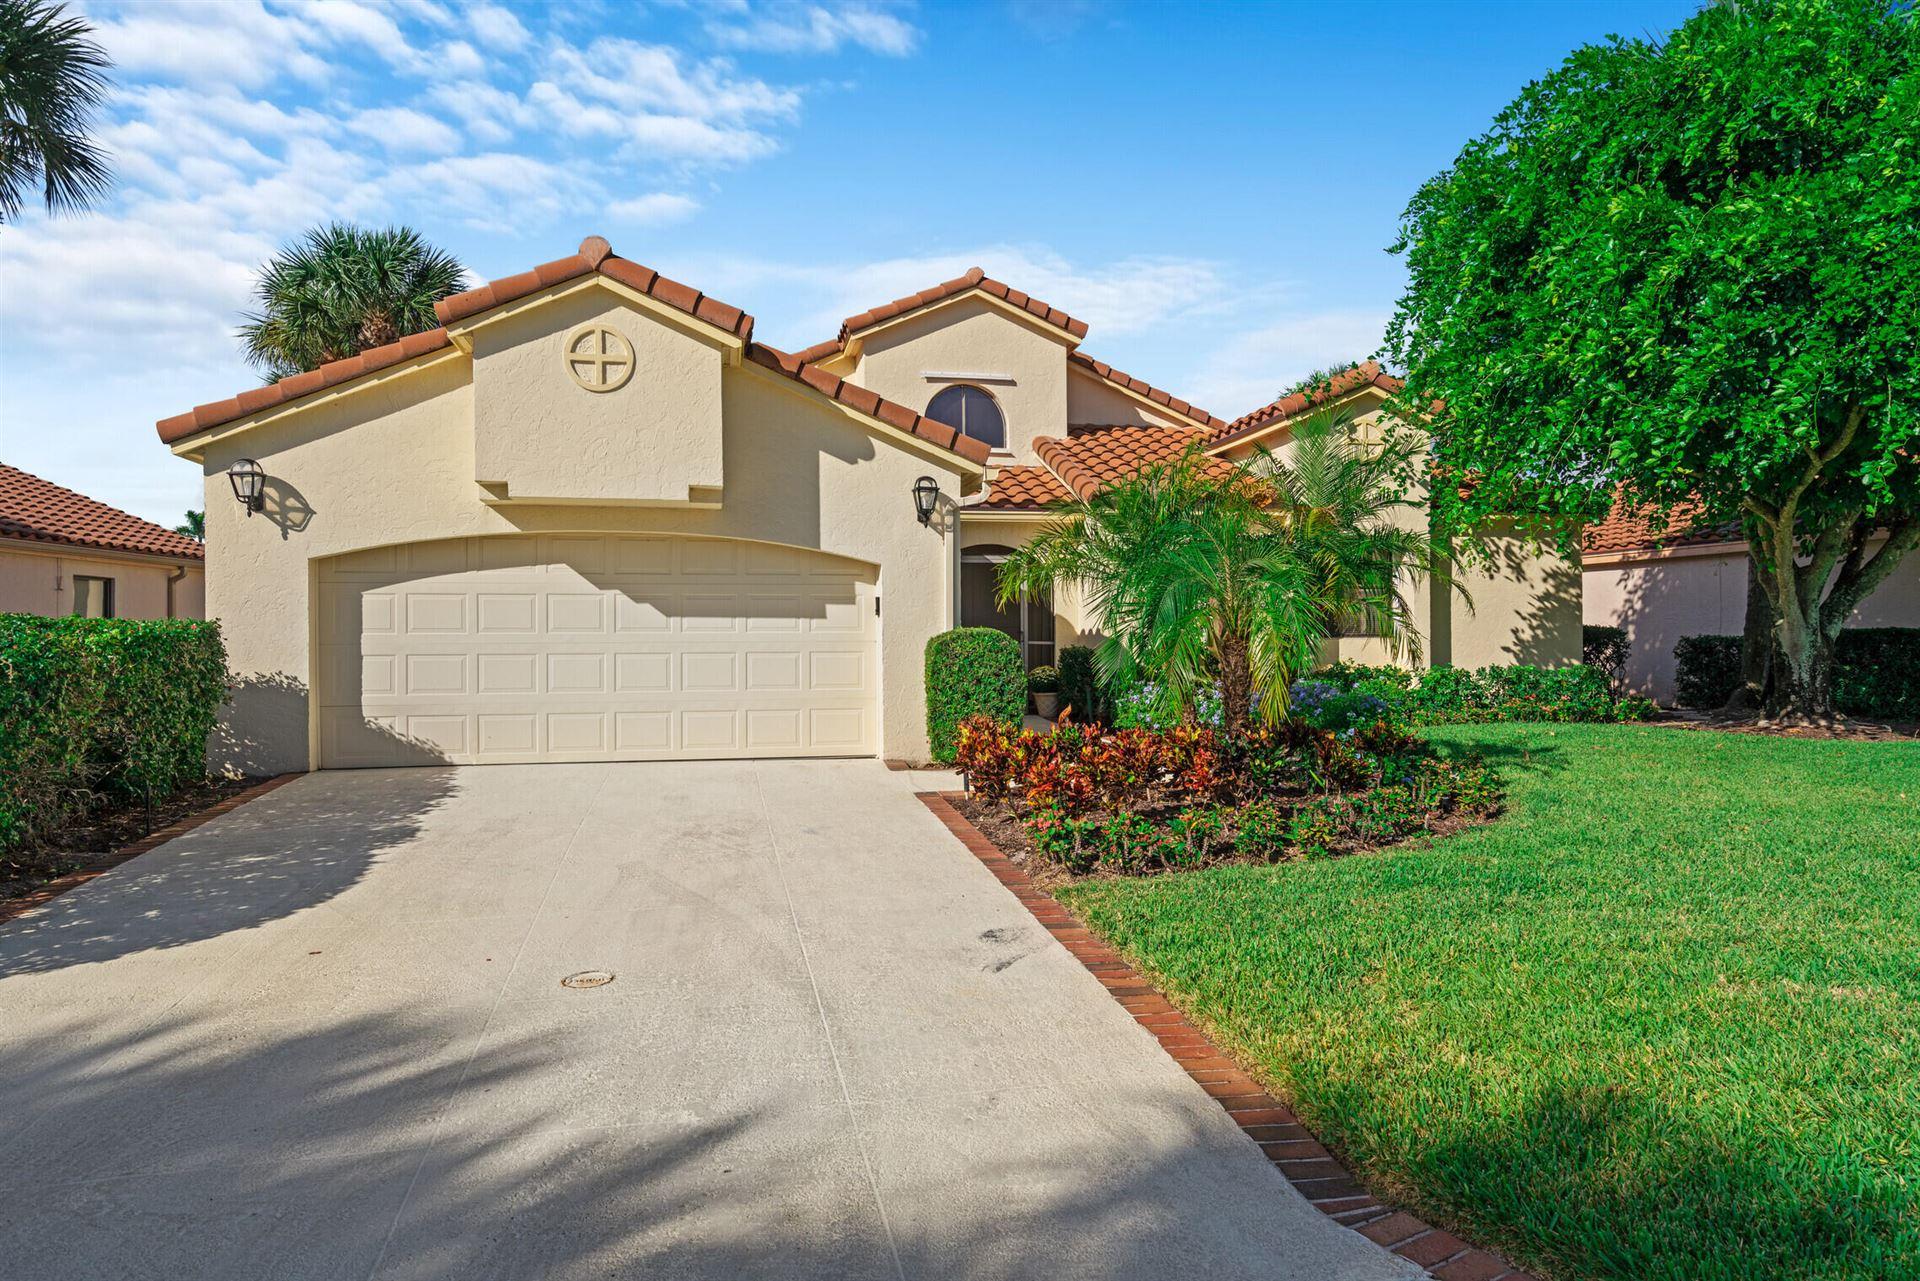 Photo of 16663 Hidden Cove Drive, Jupiter, FL 33477 (MLS # RX-10750665)